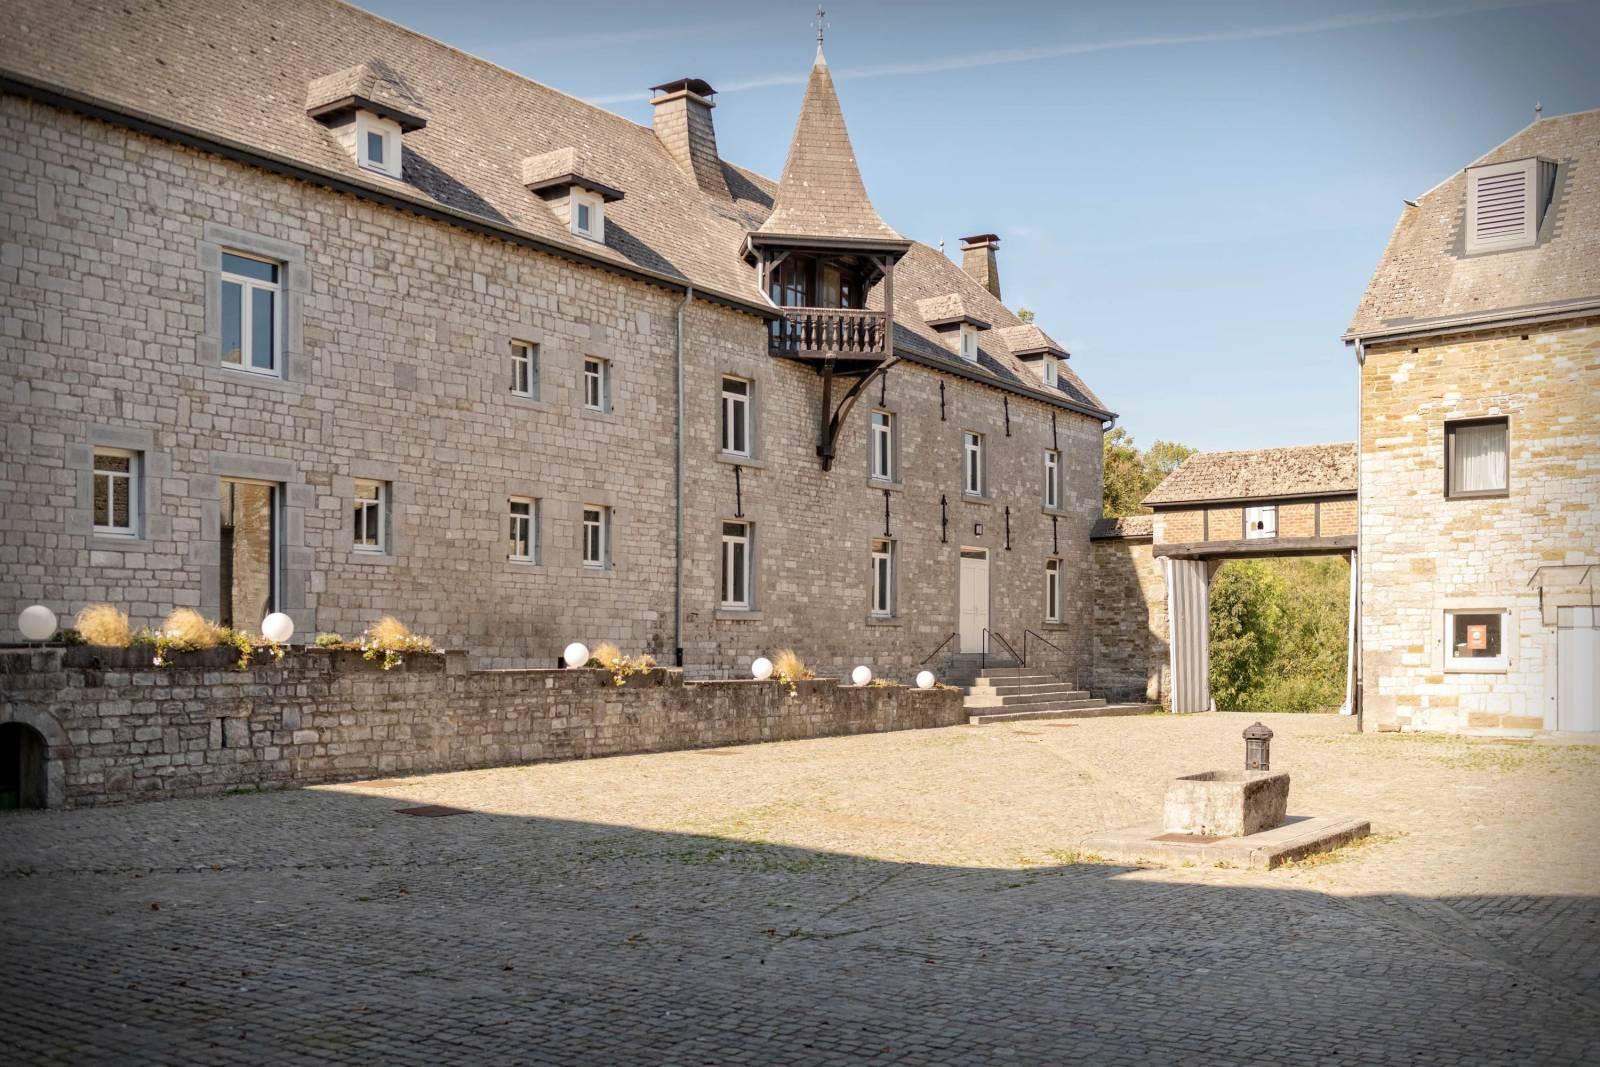 Five Nations Golf Club & Hotel - Durbuy - Feestzaal - Trouwzaal - Trouwlocatie - House of Weddings - 4